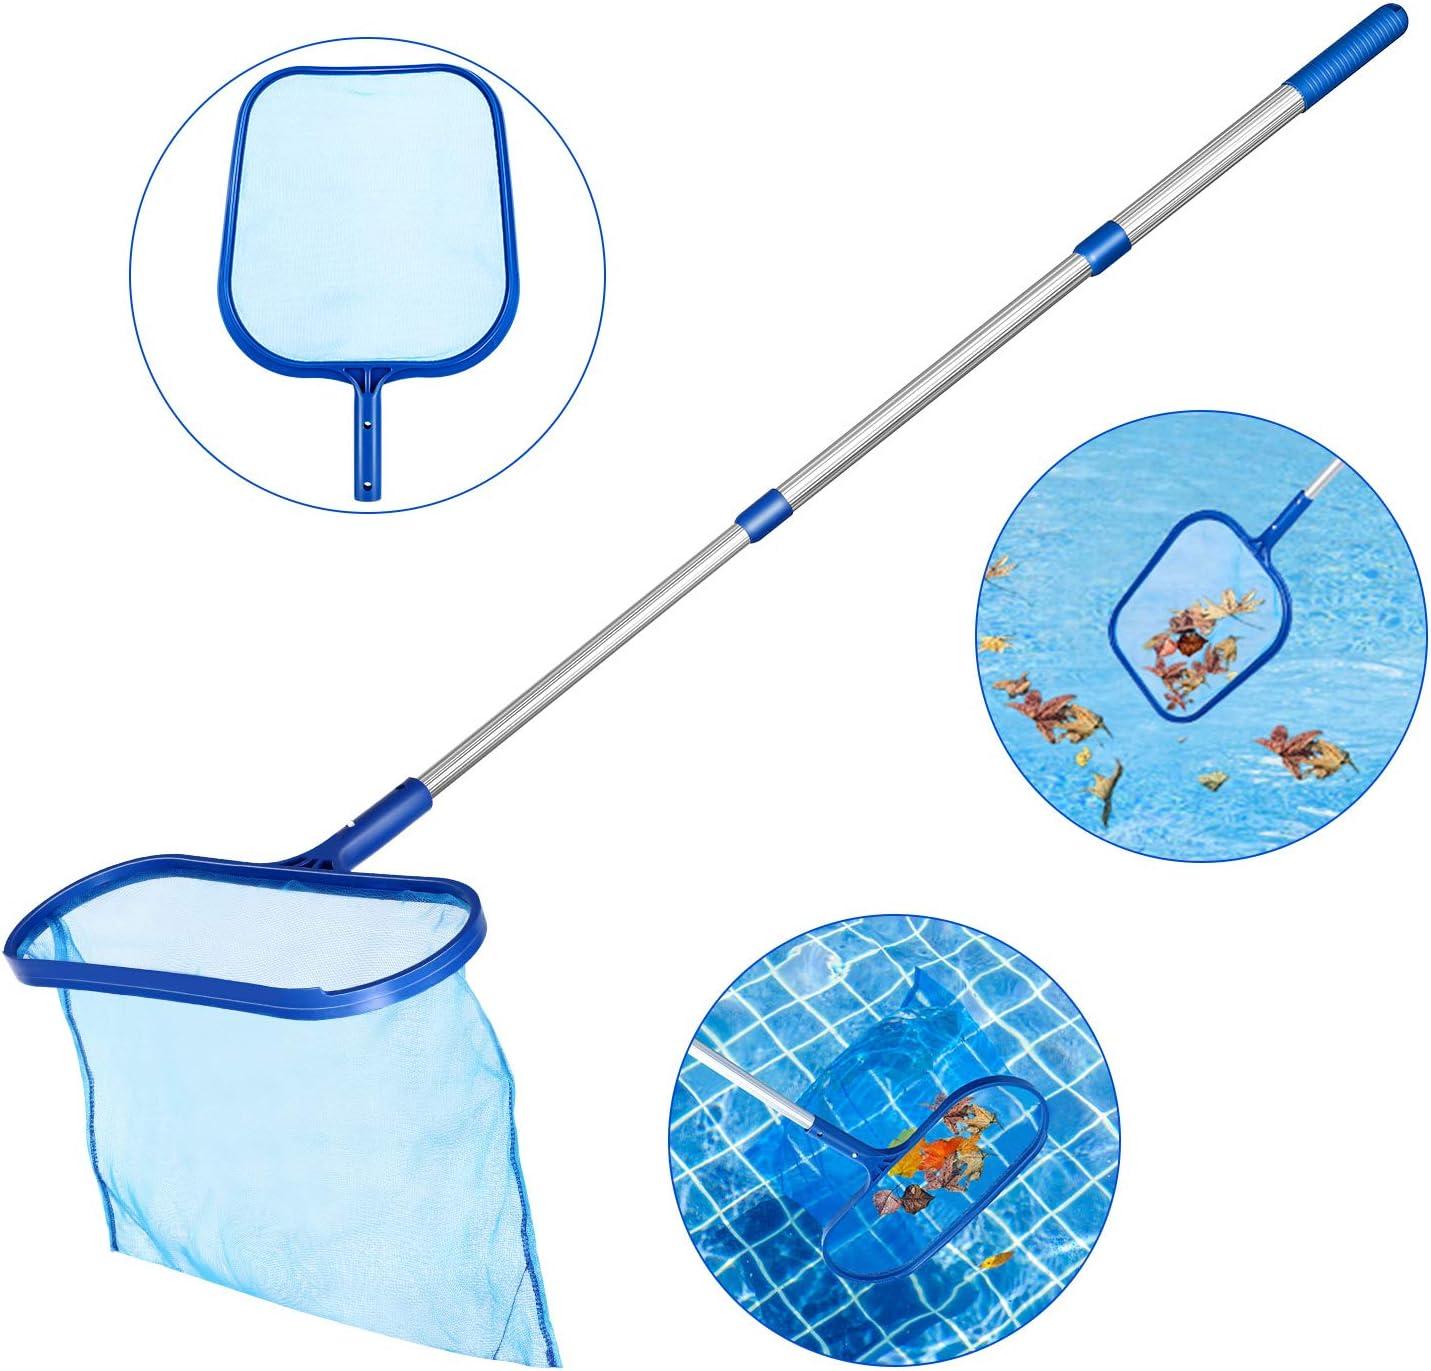 Tencoz Recogehojas para Piscinas, Pool Net Leaf Skimmer, Red para Piscinas con Poste de Aluminio de 1,2 m Recogehojas Piscina, Limpia Piscinas Red (2)